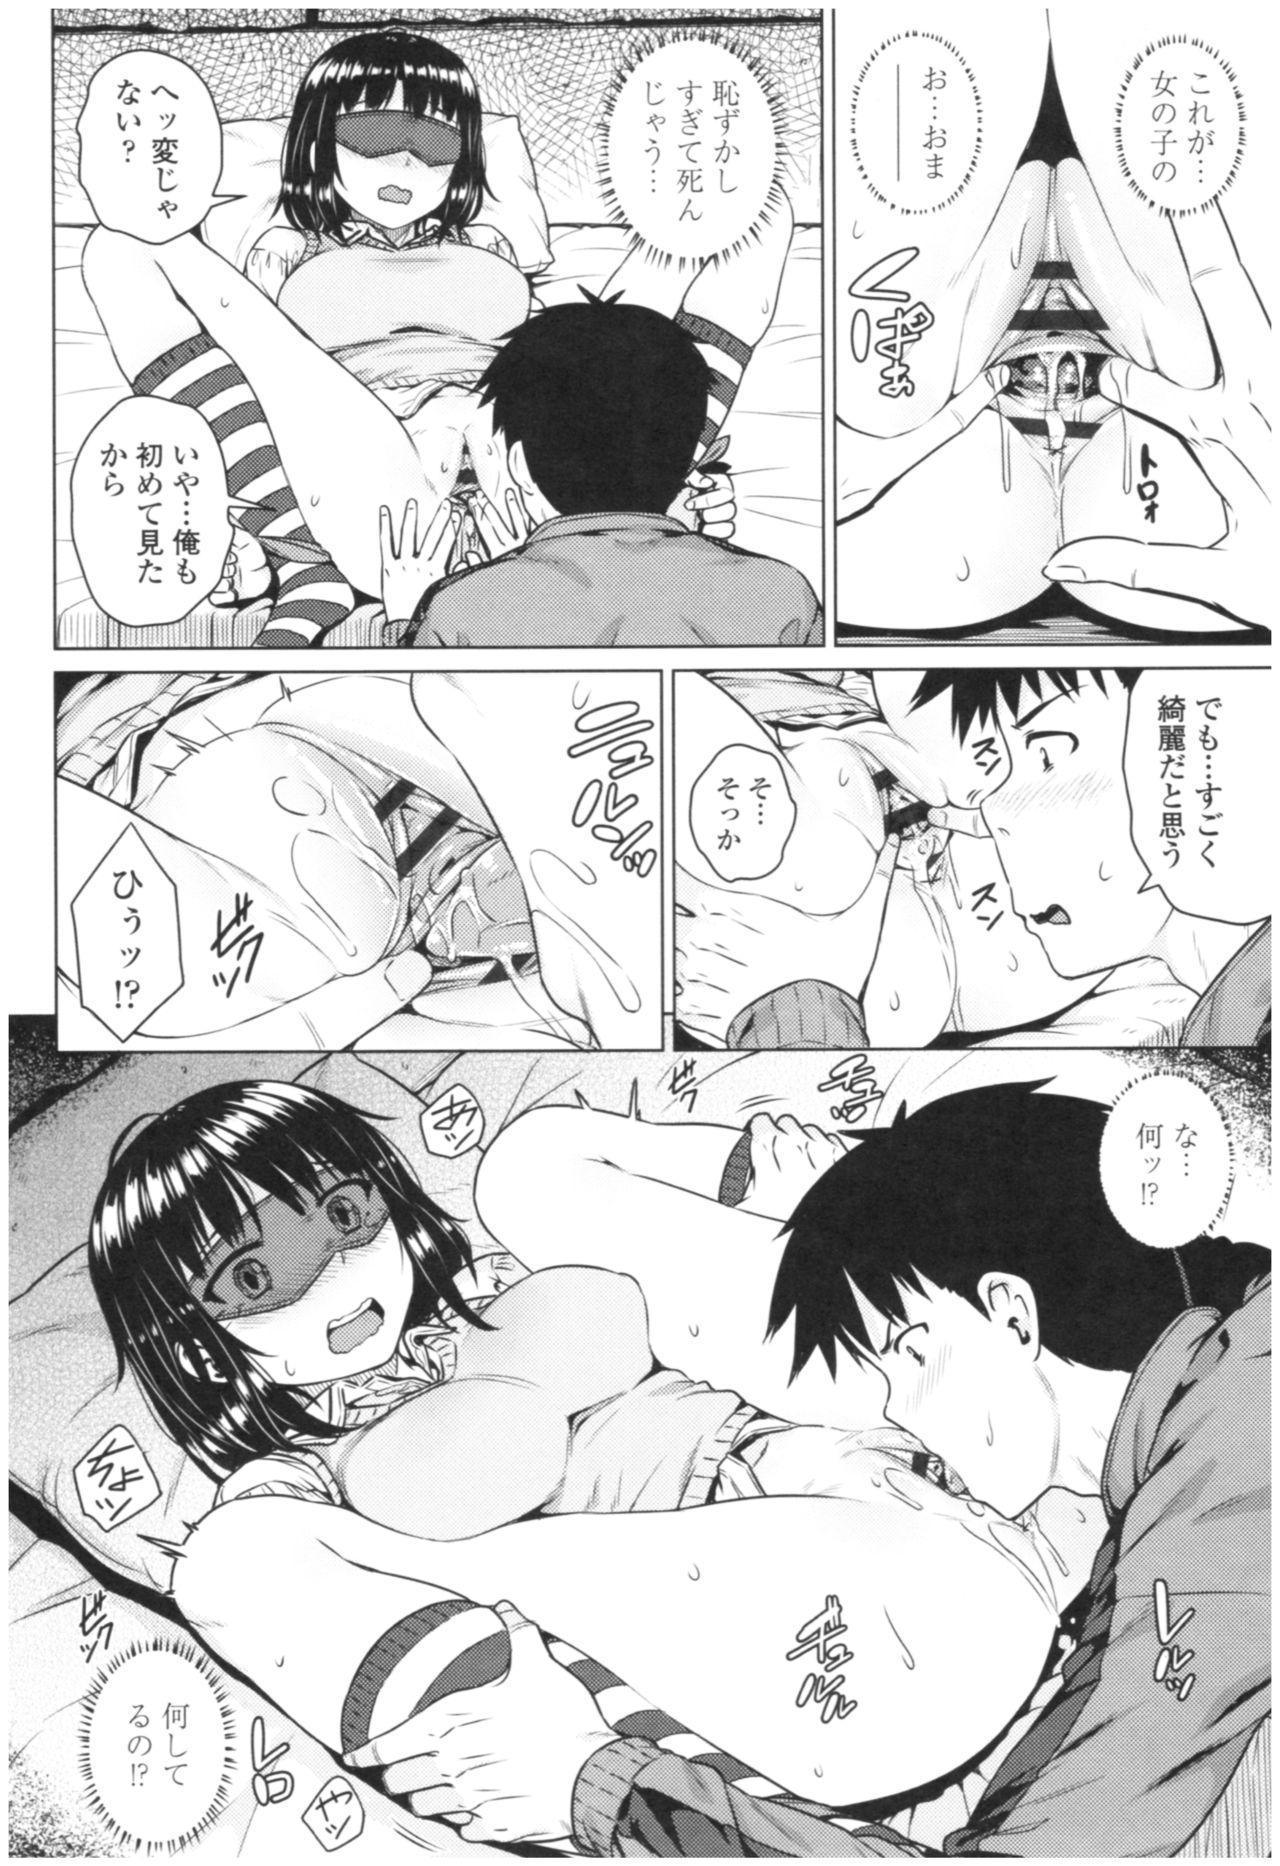 Bitch Kanojo no Hatsukoi Jouji - Her Lewd First Love and SEX 79